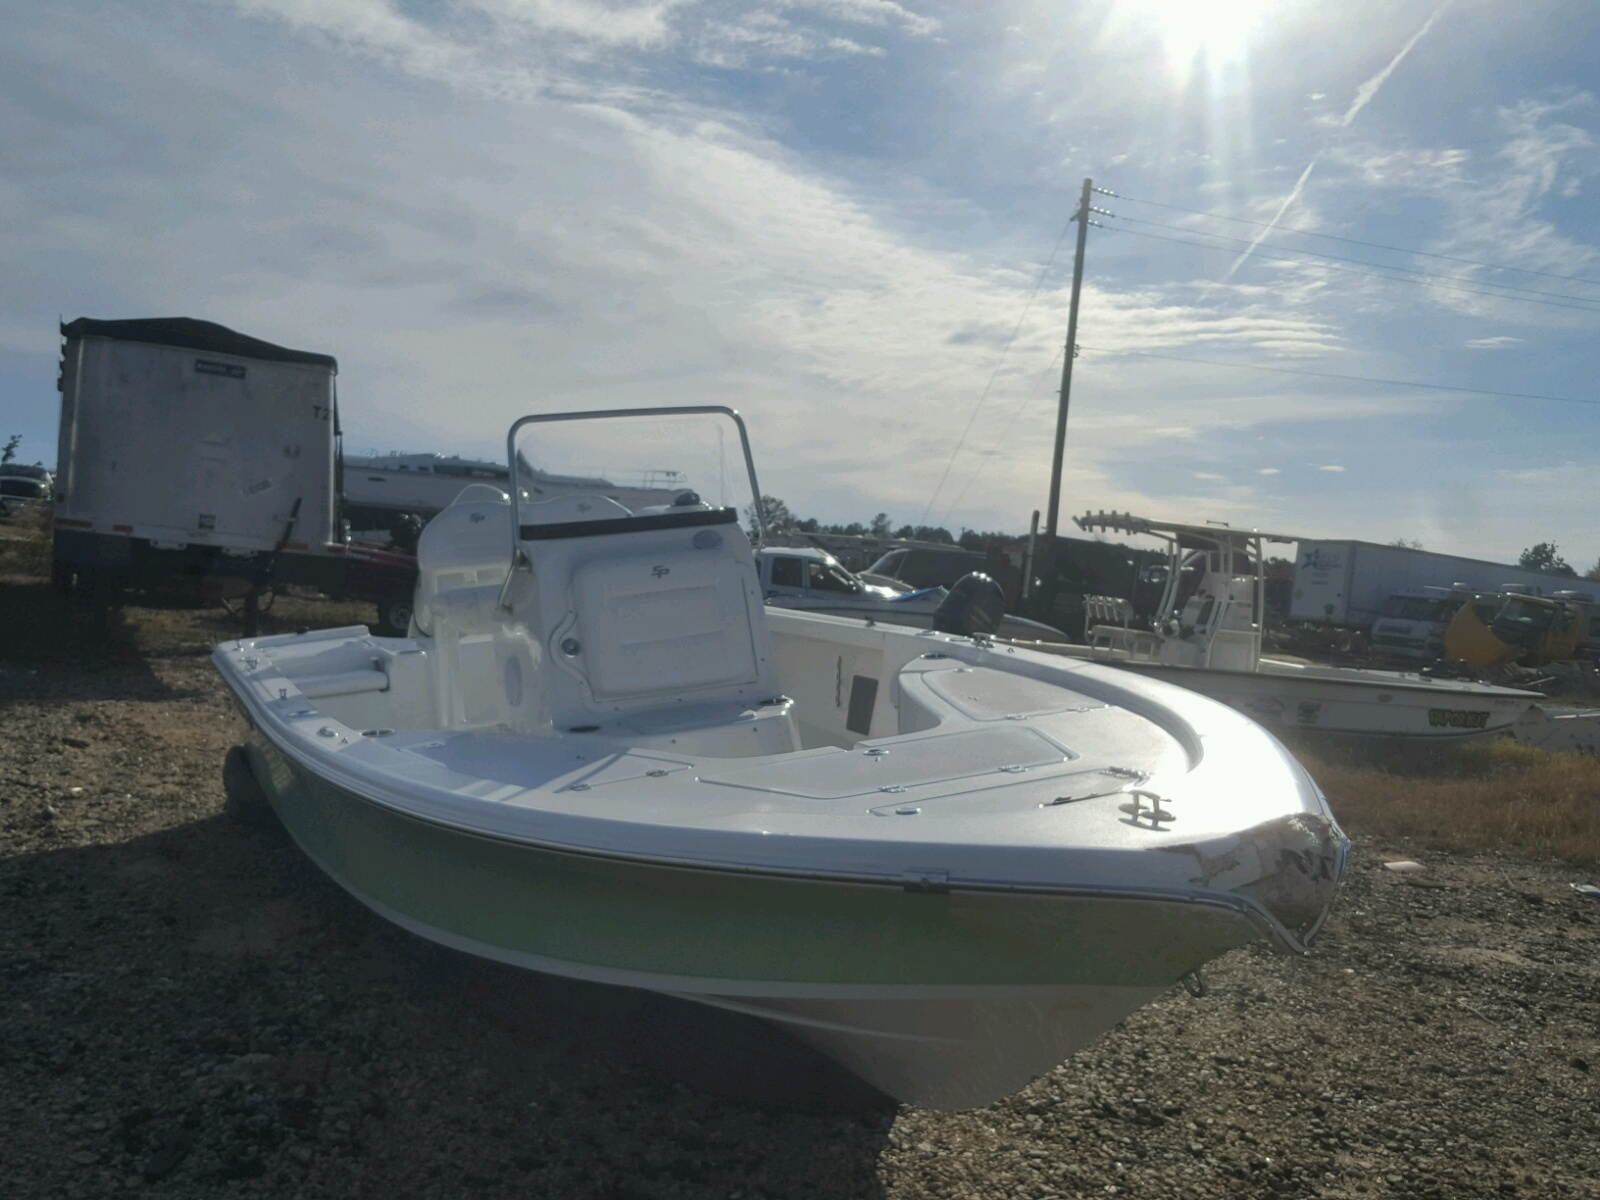 2018 Seaa Boat in SC - Columbia (SPBAN261L718) for Sale ...